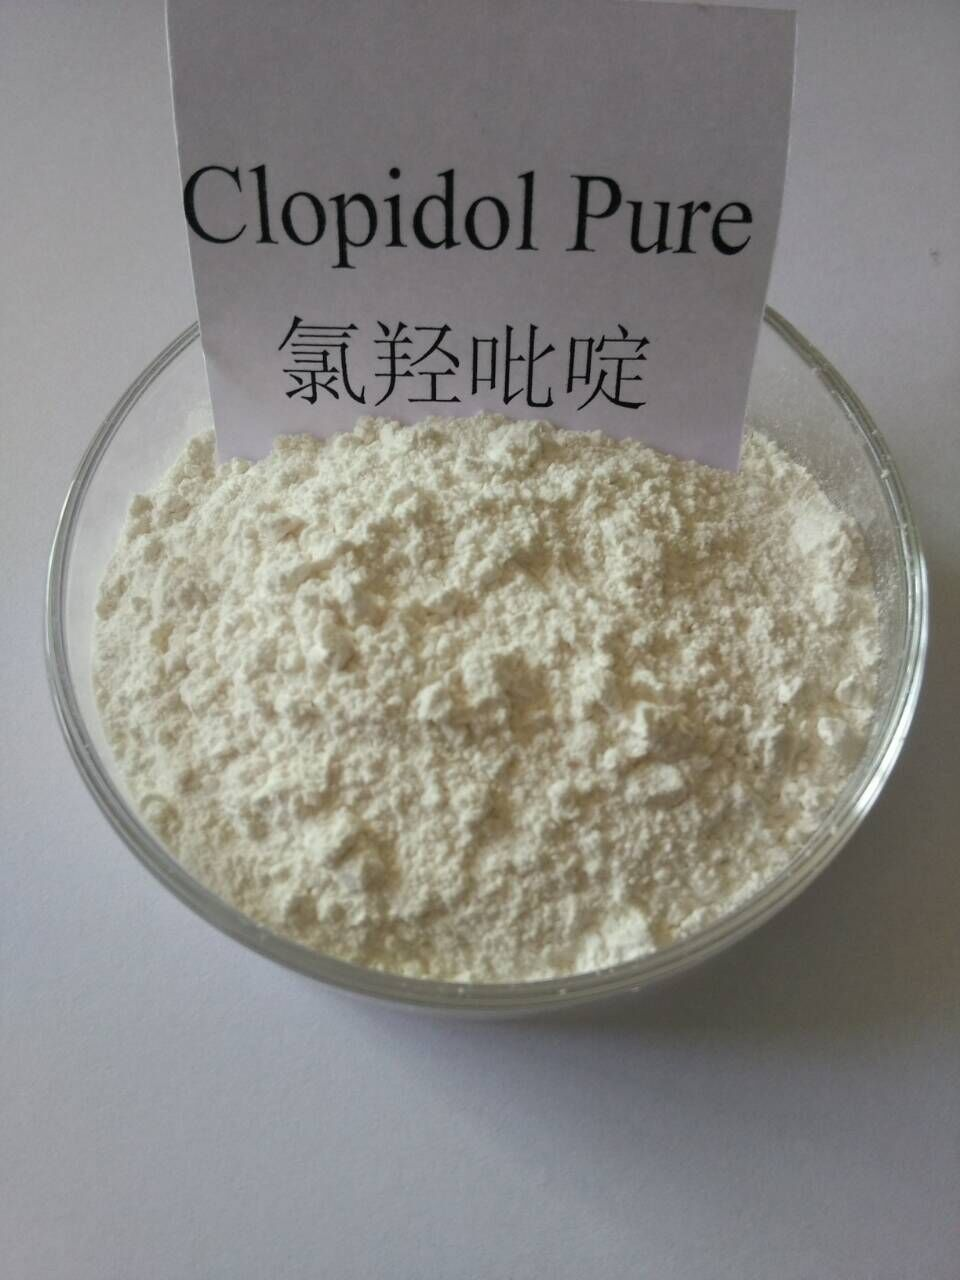 Feed Additives Veterinary Medicine High Quality 12%, 25% Clopidol Premix / Pure Clopidol Animal